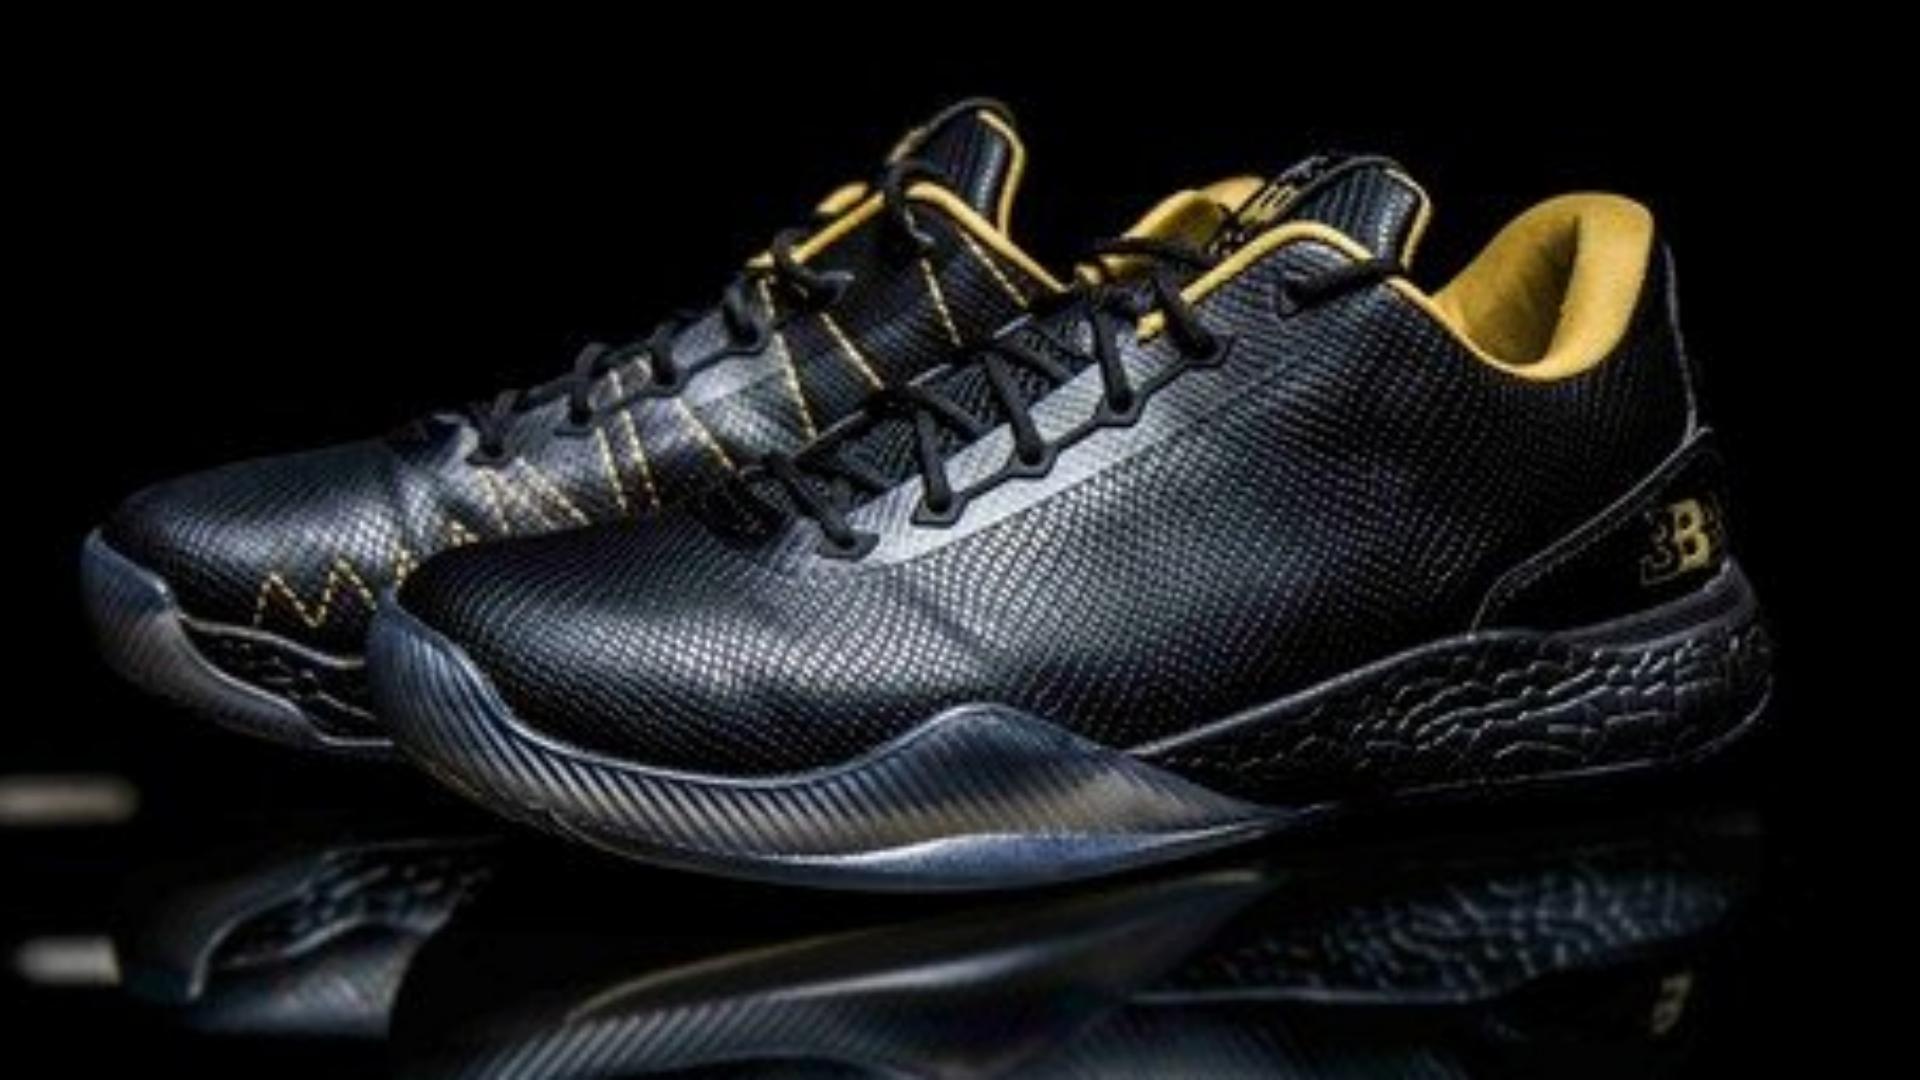 0644e0fa47b Buyer beware  No refunds on Lonzo Ball s  495 ZO2 sneakers ...